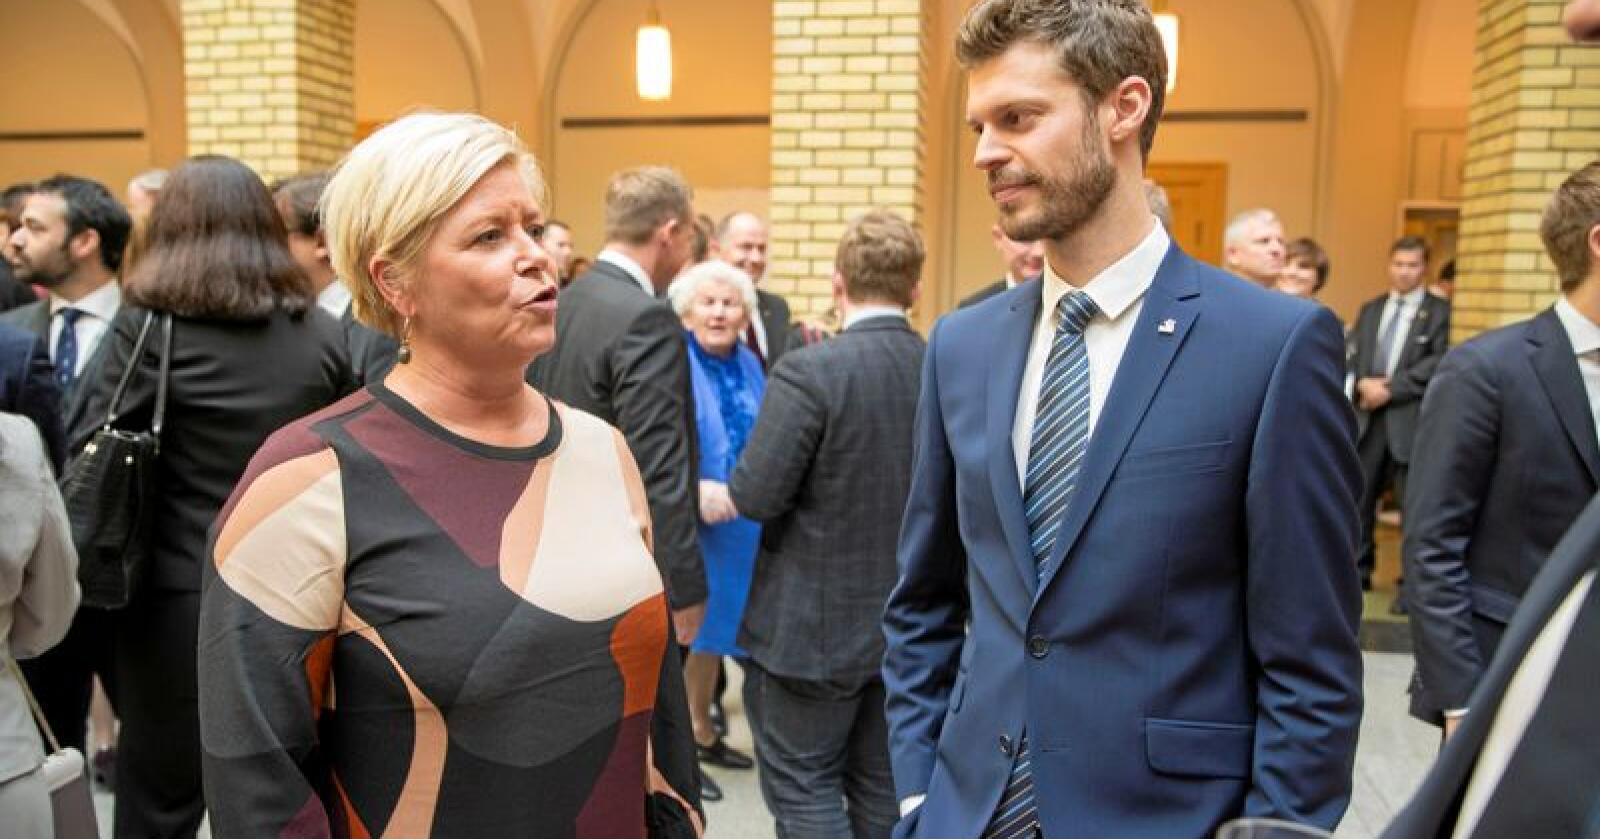 Finansminister og Frp-leiar Siv Jensen saman med Raudt-leiar Bjørnar Moxnes. Deira parti har tent oppslutnad etter den siste månaden med uro. Foto: Vidar Ruud / NTB scanpix